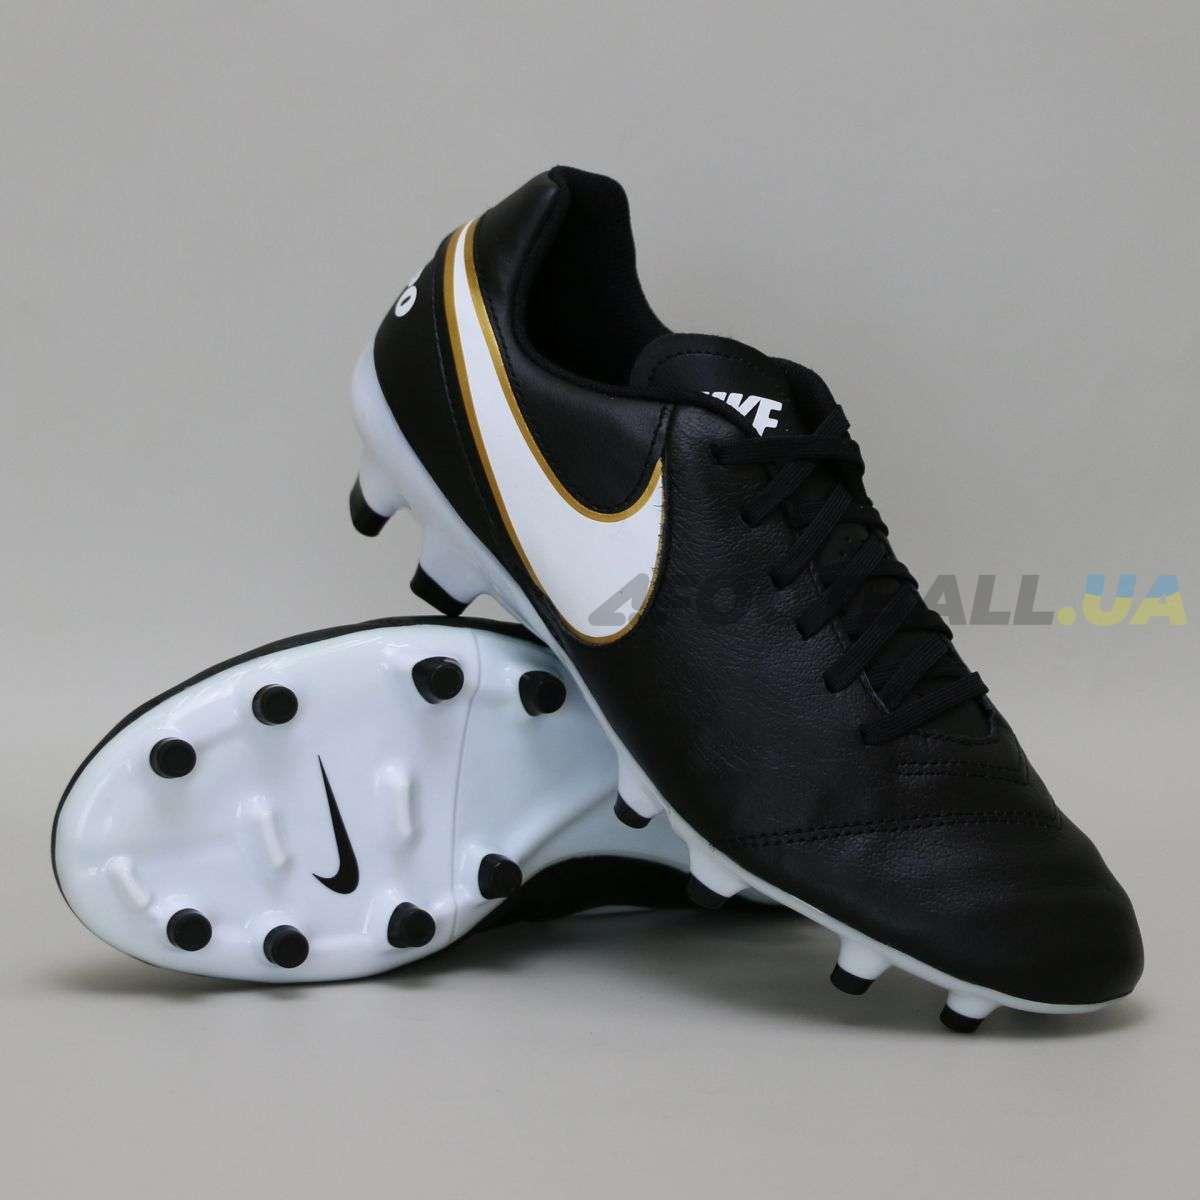 78ae2802 Бутсы Nike Tiempo GENIO II Leather FG - Black/Gold купить у ...